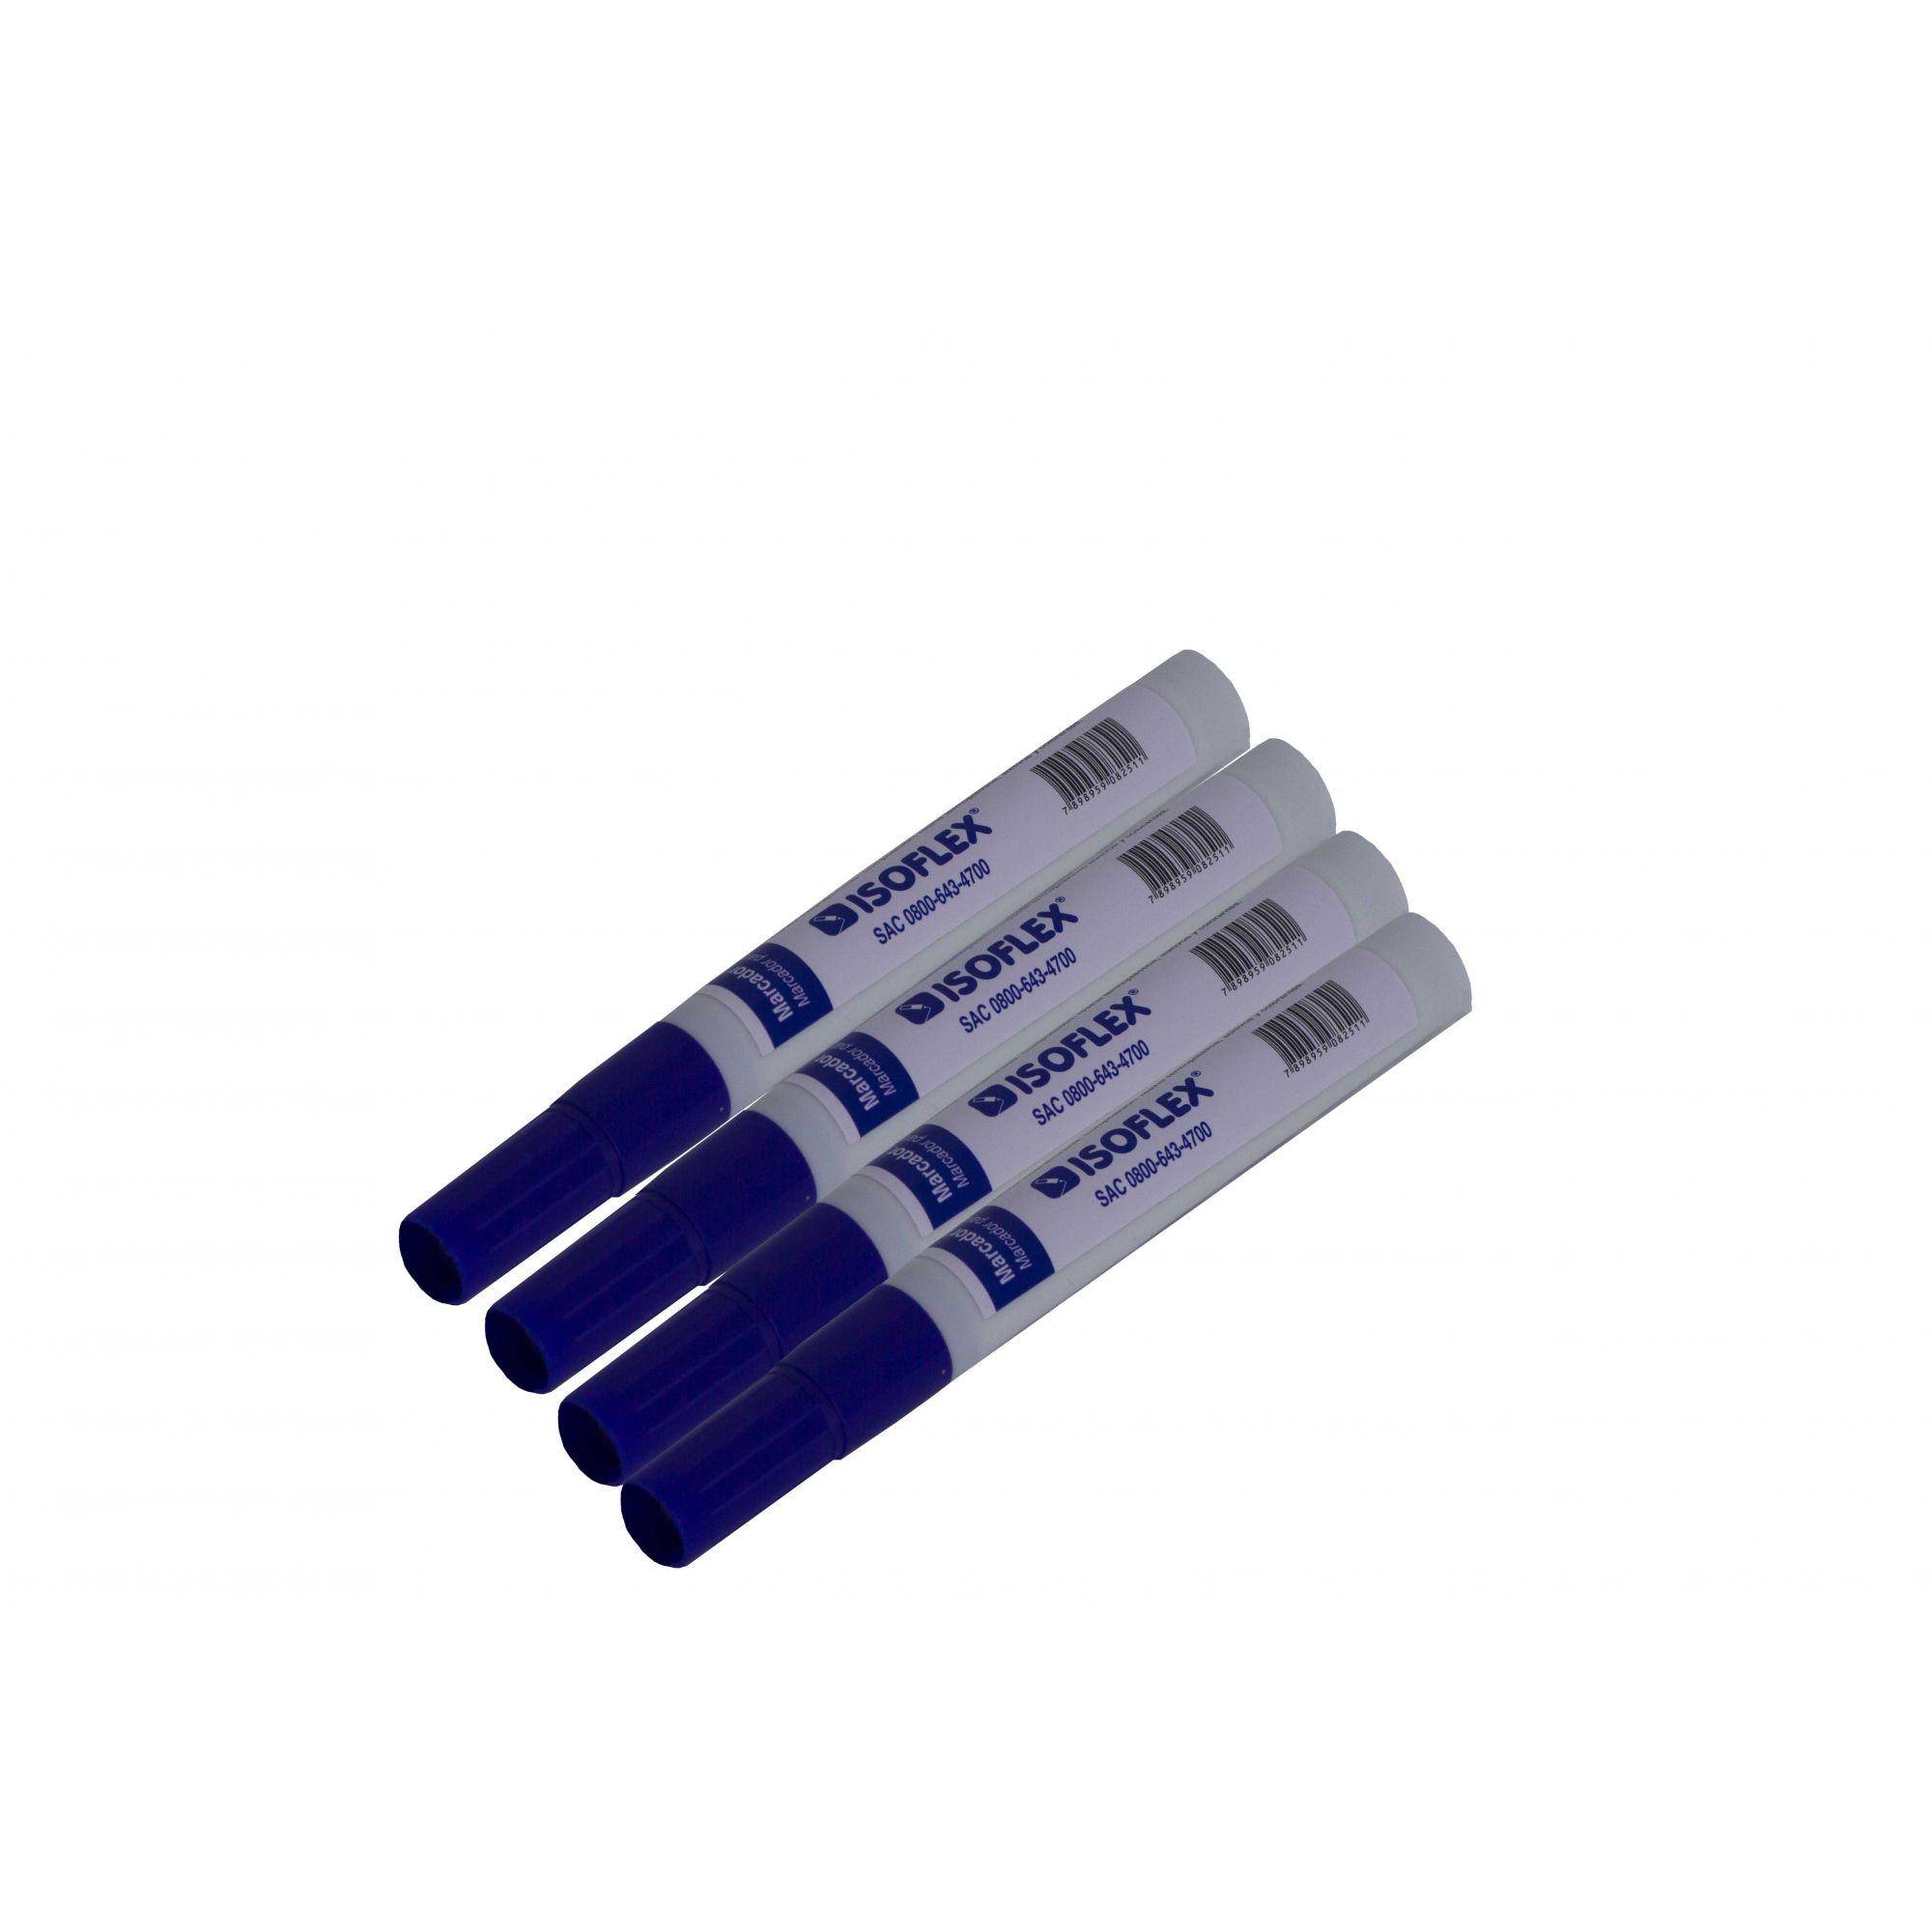 Kit de marcador de quadro branco c / 12 unidades - Isoflex